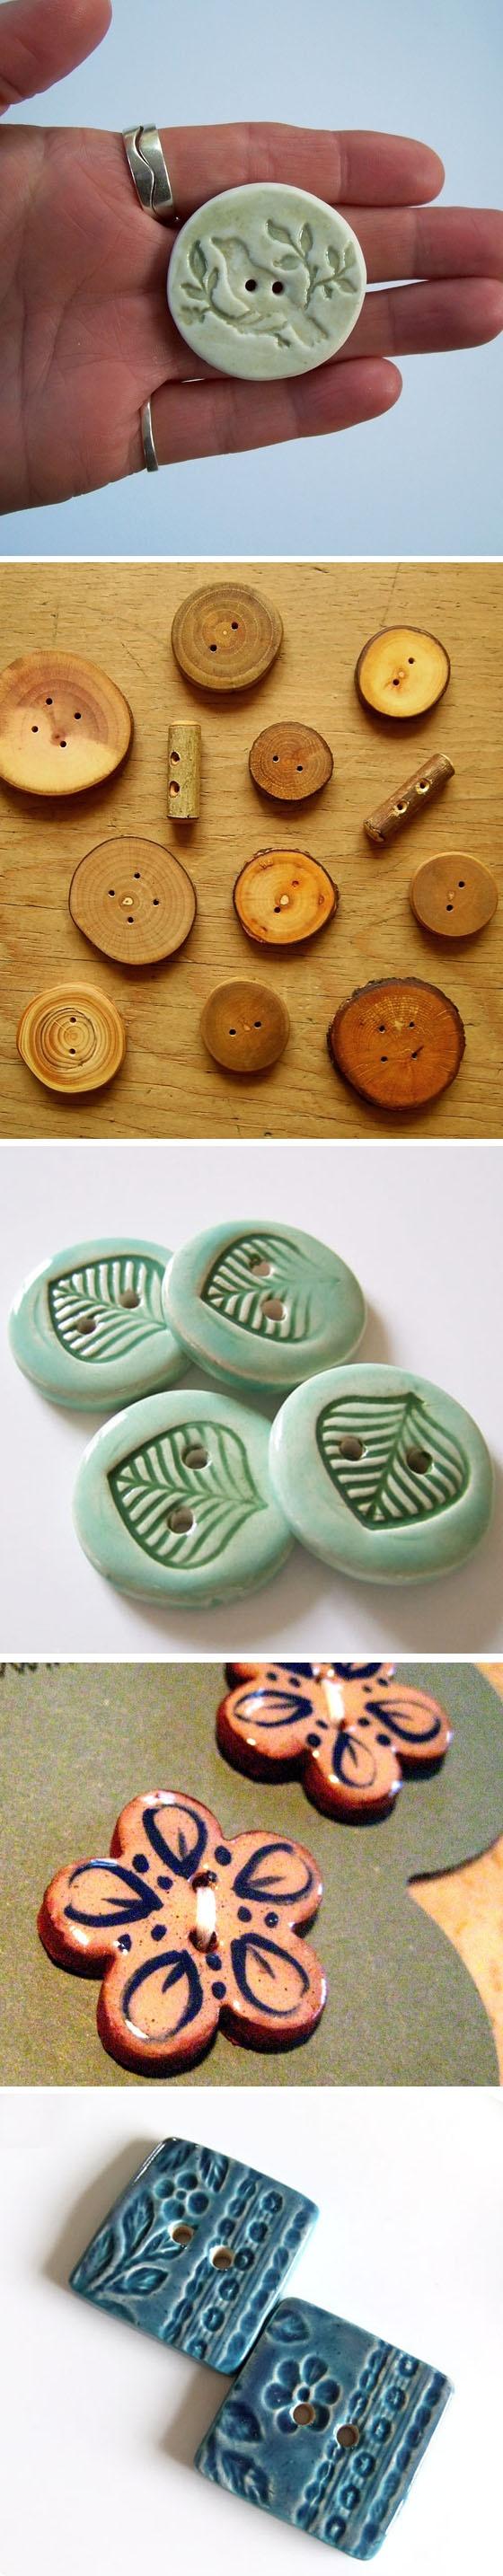 Handmade Buttons | One Sugar Please